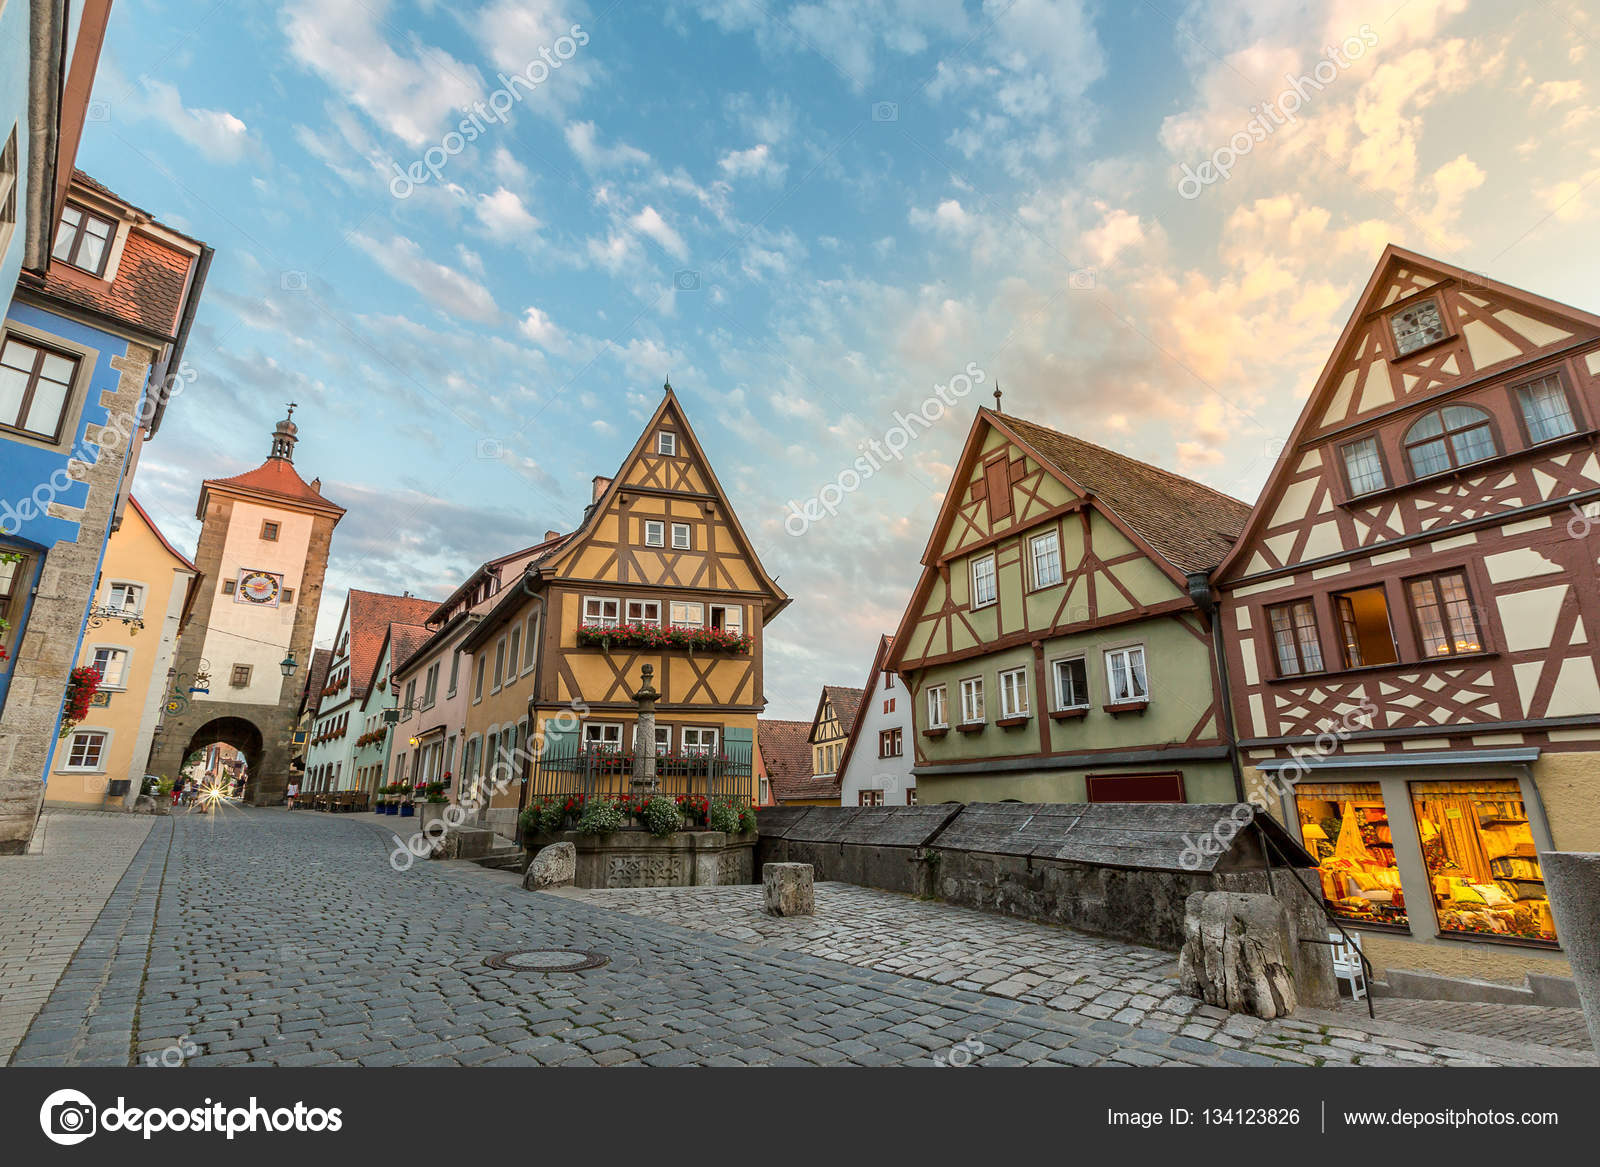 rothenburg ob der tauber at sunset ストック写真 vichie81 134123826